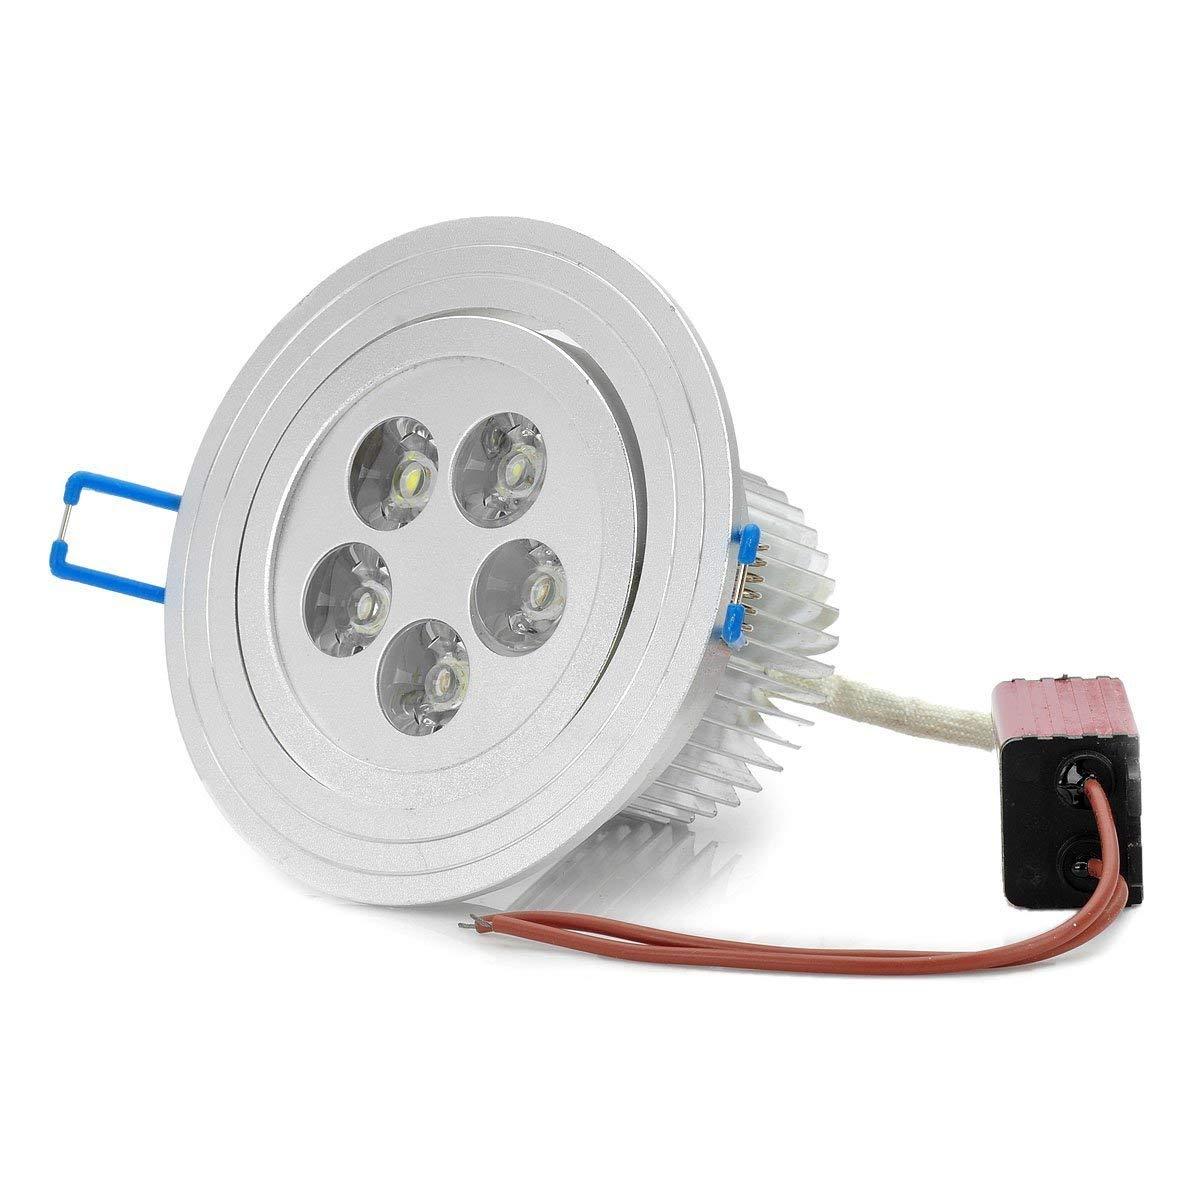 Cheap White Led Driver Circuit Diagram Find 100 Watt Spotlight Wiring Get Quotations Myeasyshopping 5w 60006500k 400420 Lumen 5 Light Ceiling